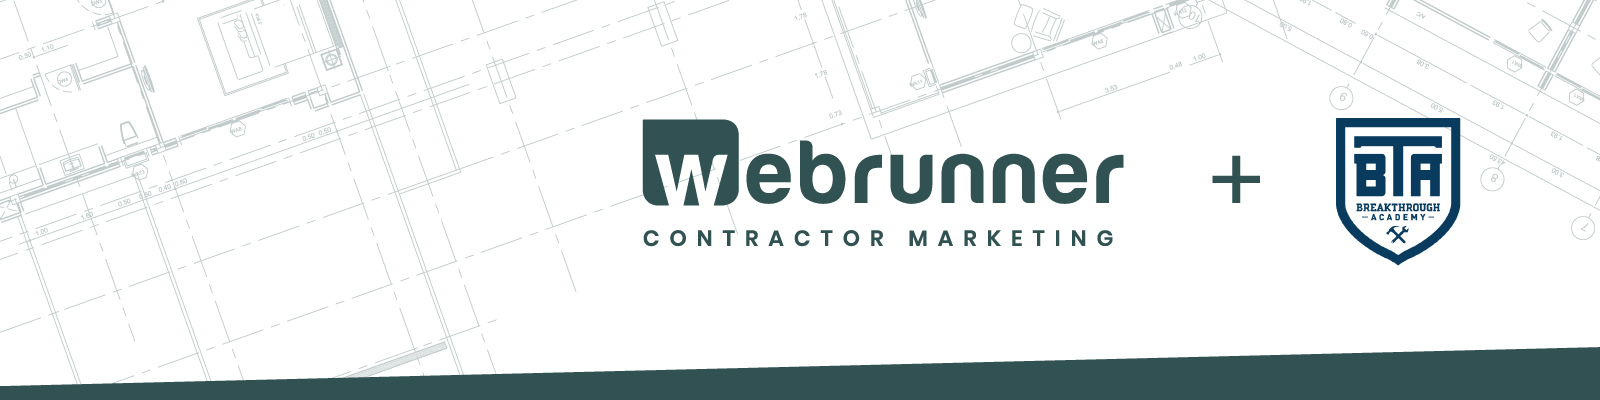 Breakthrough Academy and Webrunner Partnership